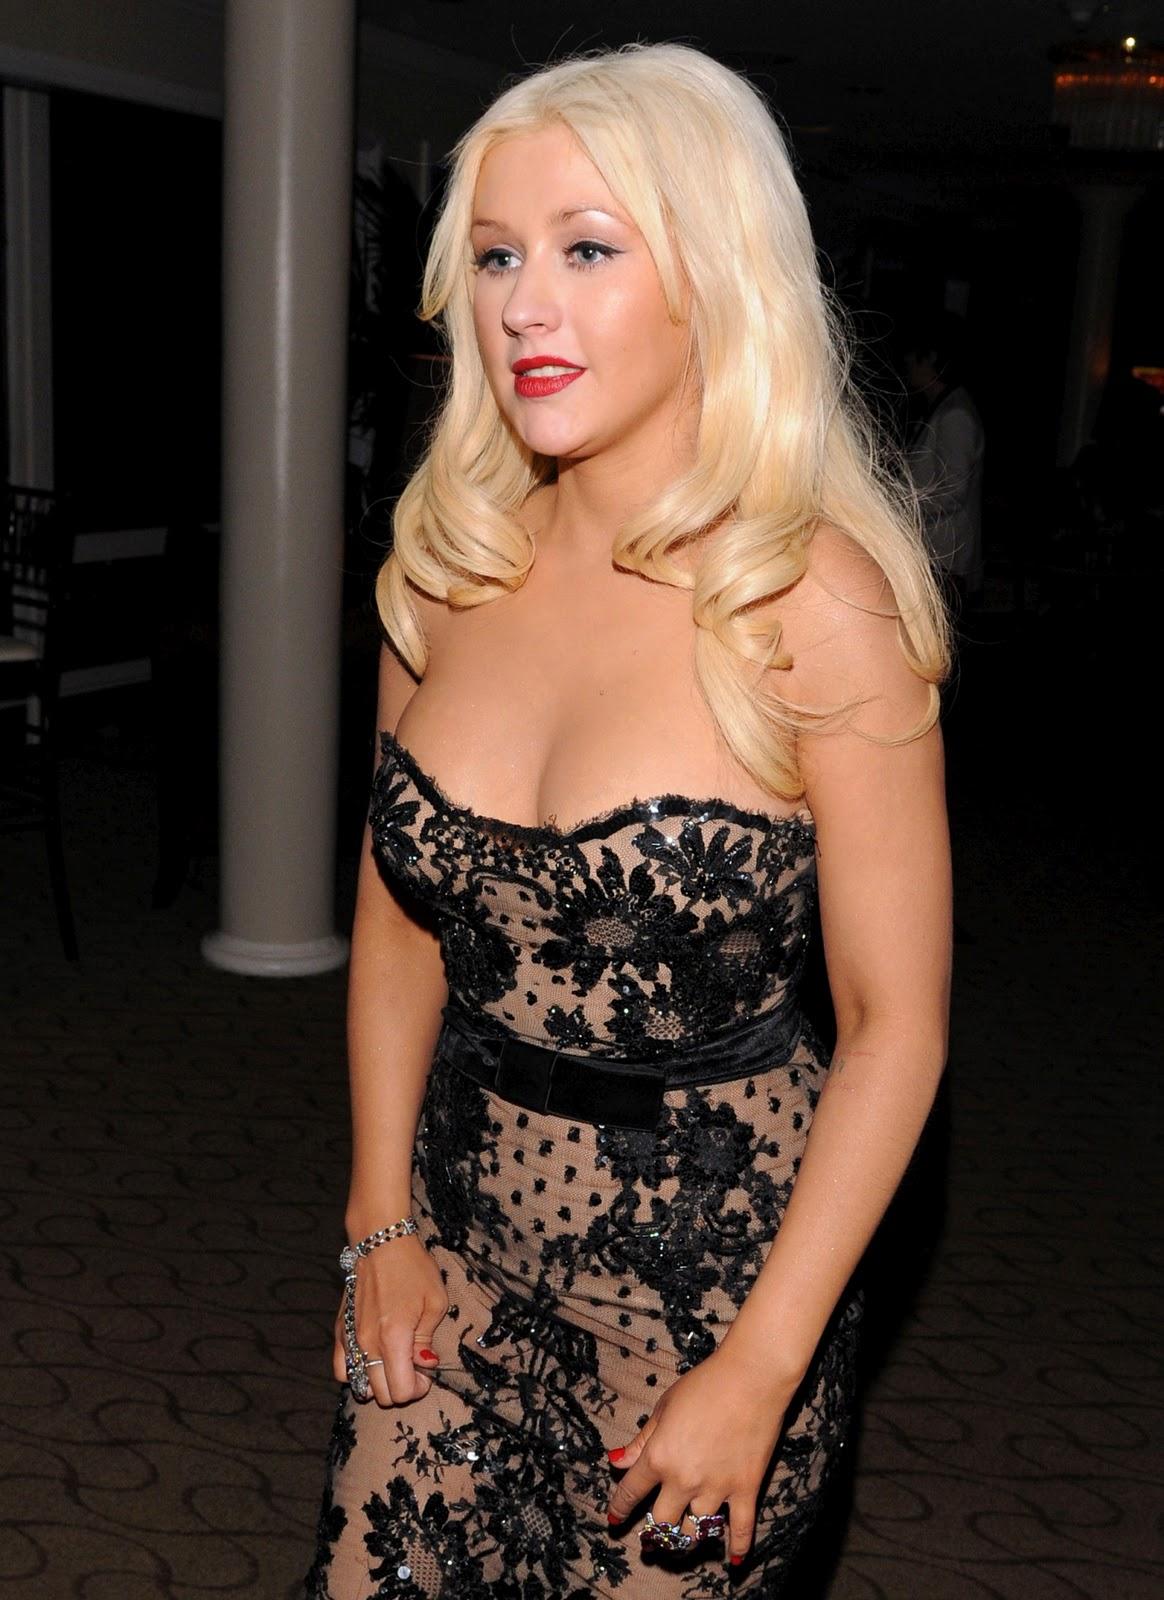 http://1.bp.blogspot.com/_u90AC4da1zY/TTVZi3HG1TI/AAAAAAAAP_w/k-21T7z-nzU/s1600/Christina-Aguilera-9.jpg